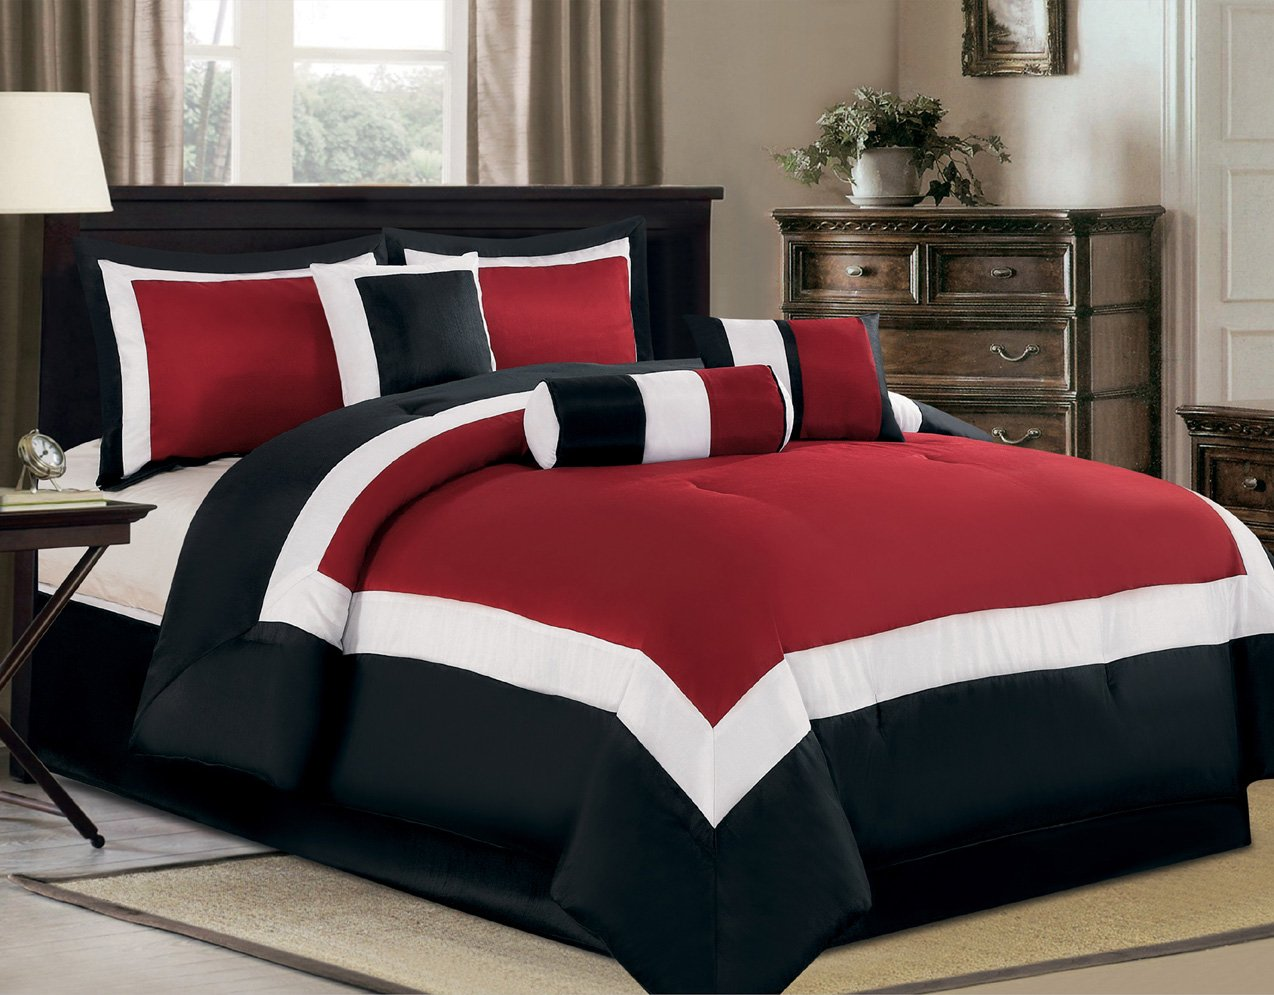 amazoncom 7 piece oversize burgundy black white color block milan comforter set 106 x 94 king size bedding home kitchen - Black And White Comforter Set